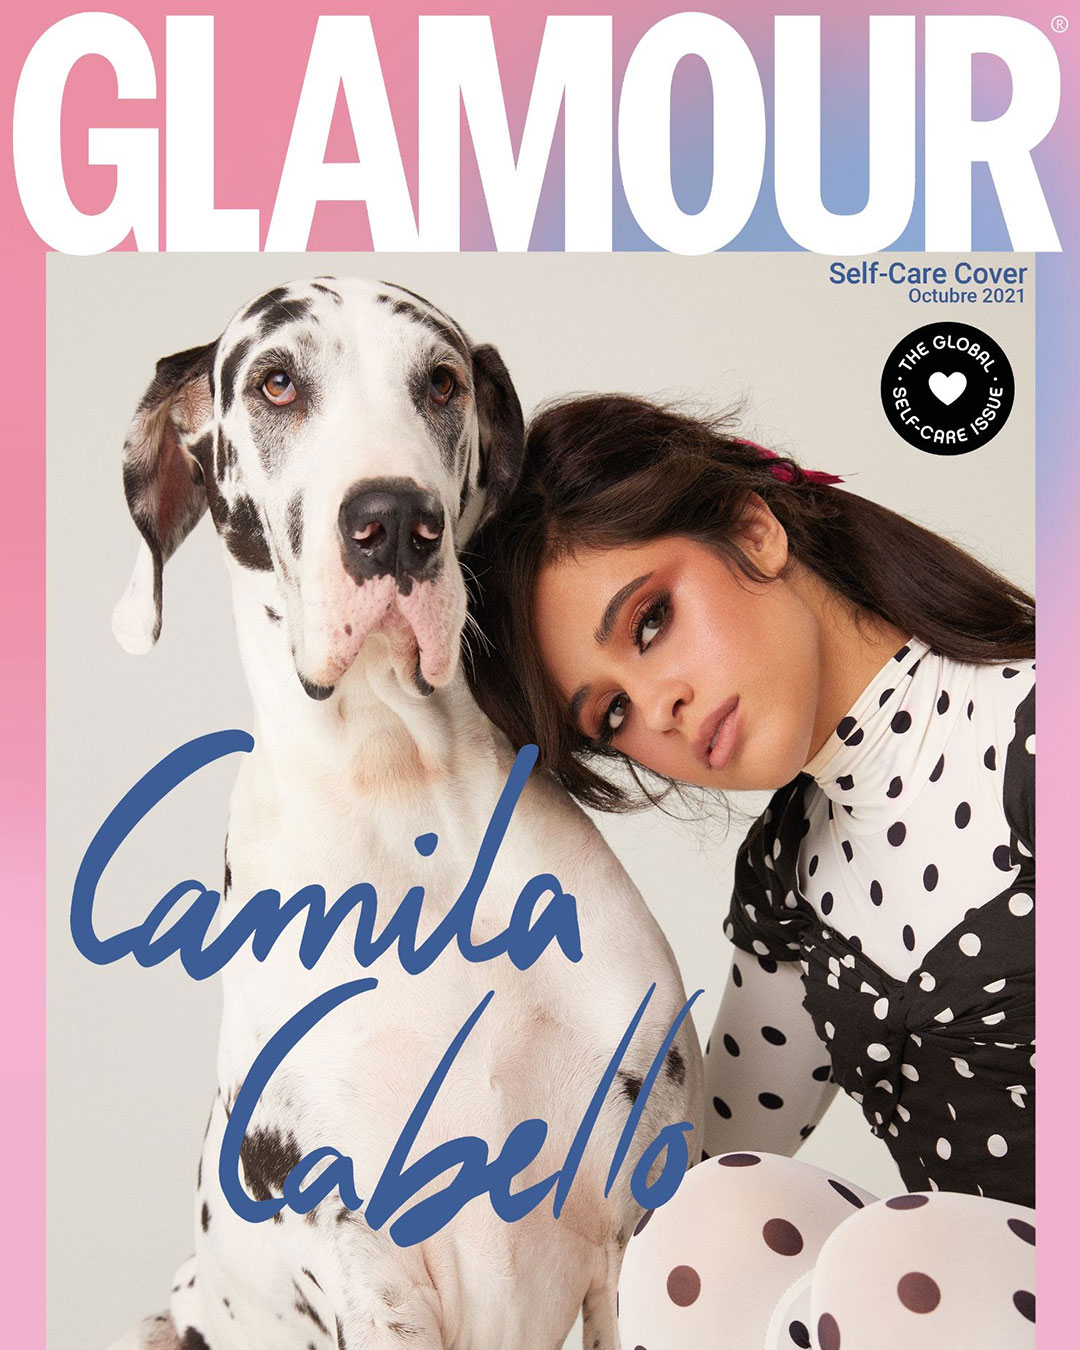 Camila Cabello Glamour 2021 13 min - Фото: Camila Cabello на обложке журнала Glamour